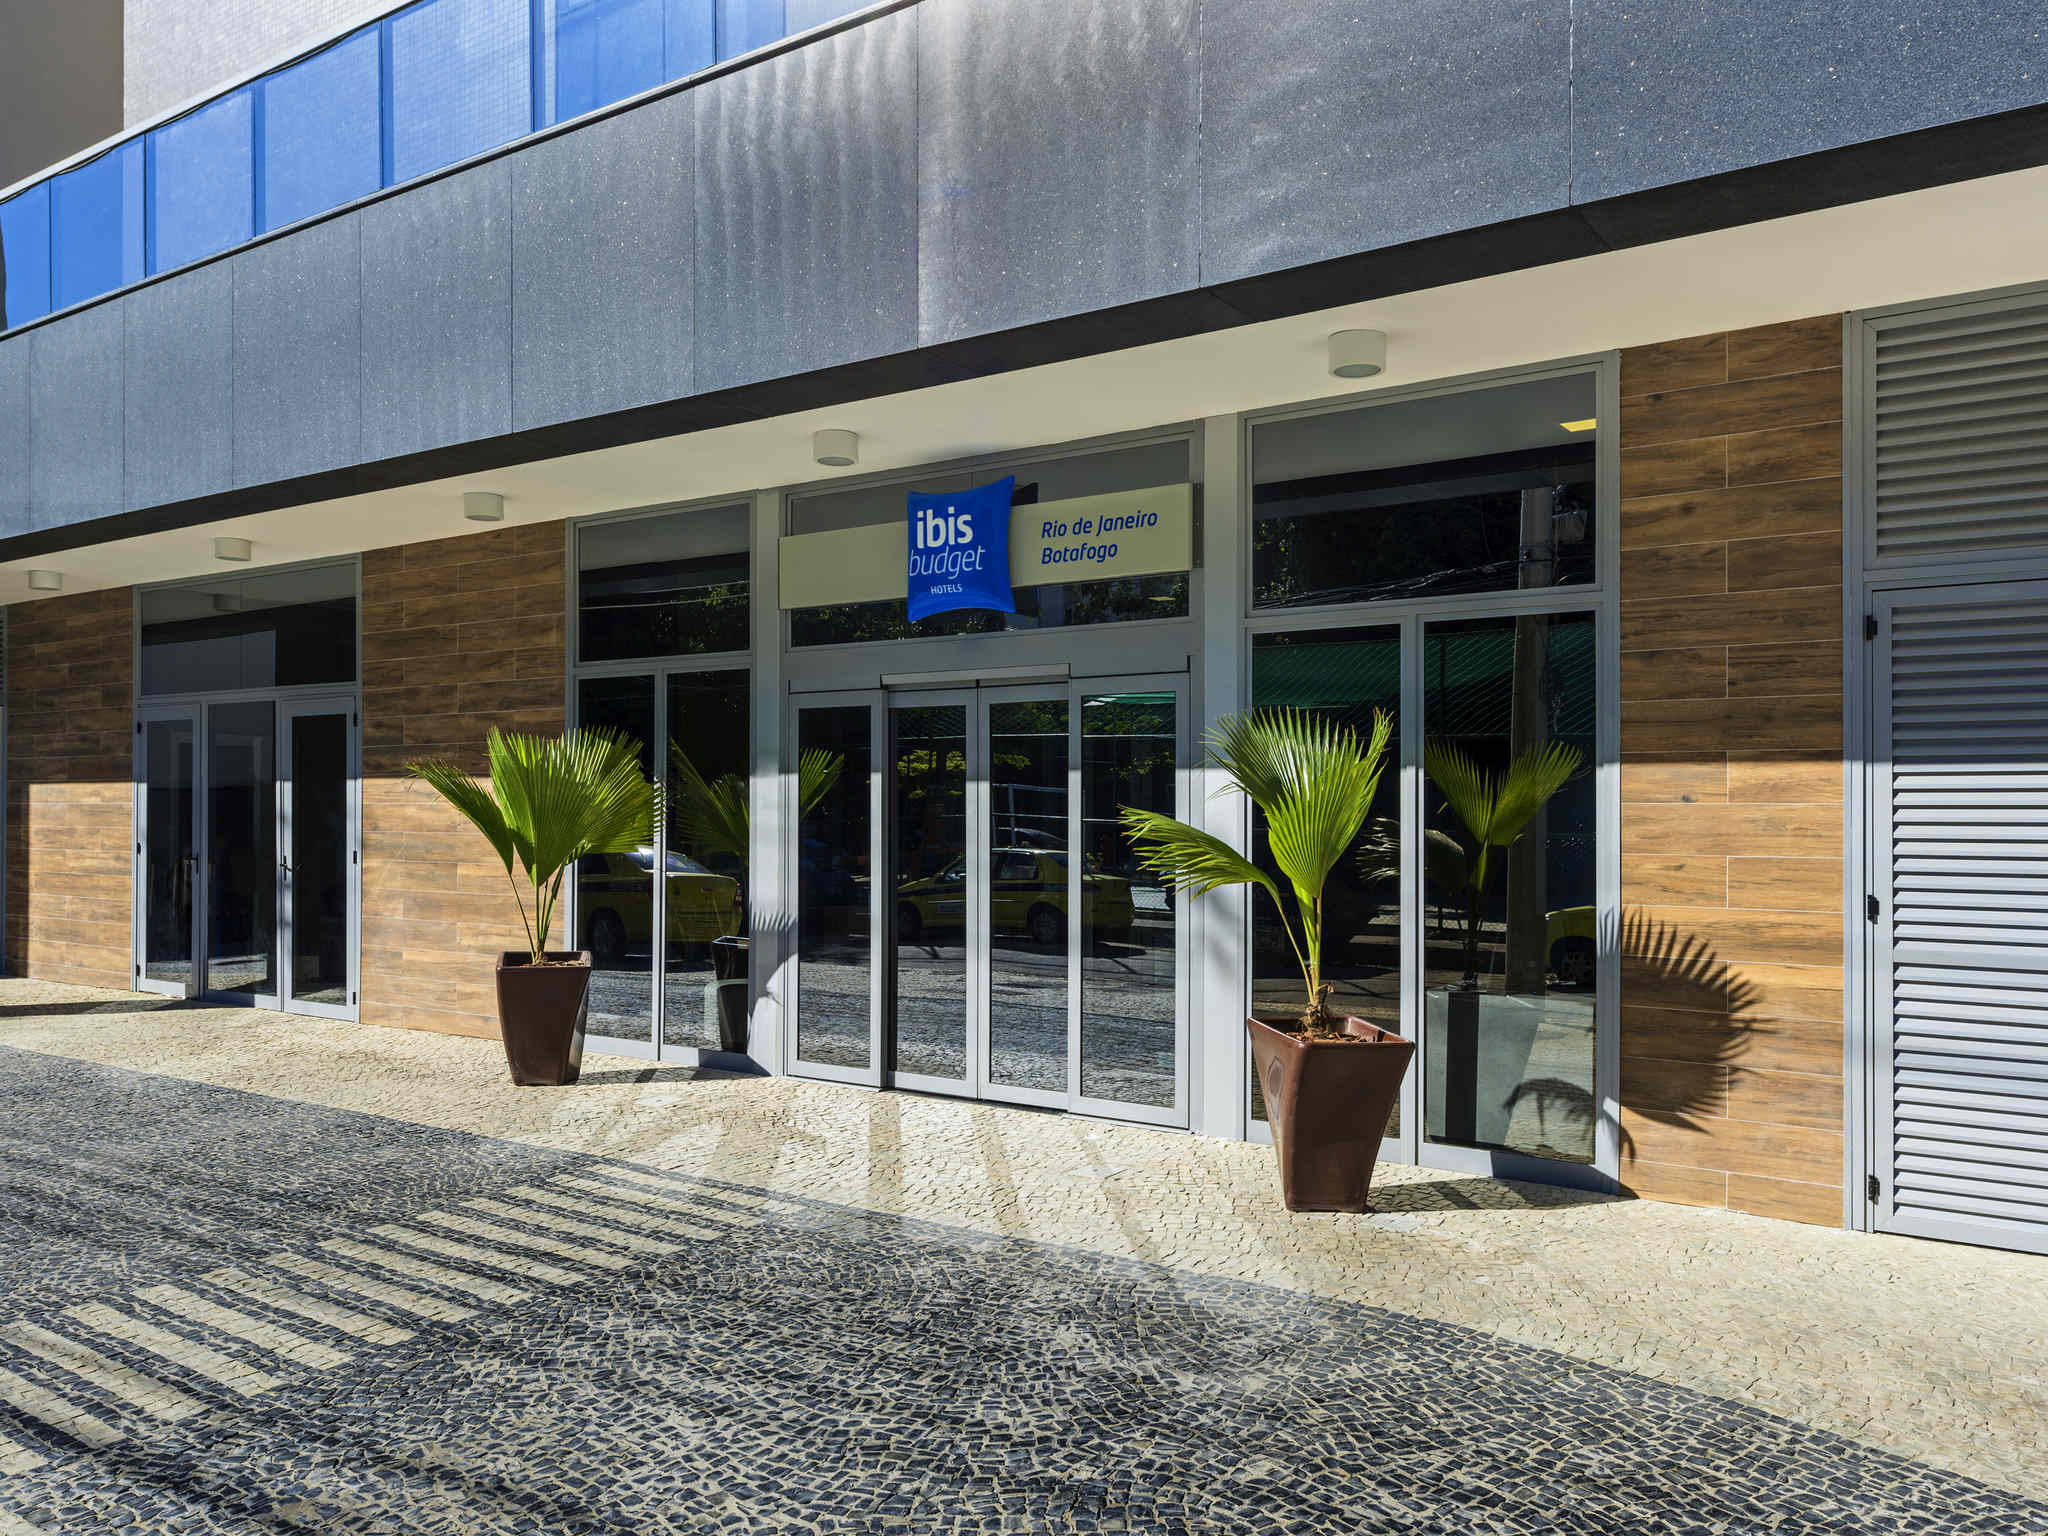 Hotell – ibis budget RJ Botafogo